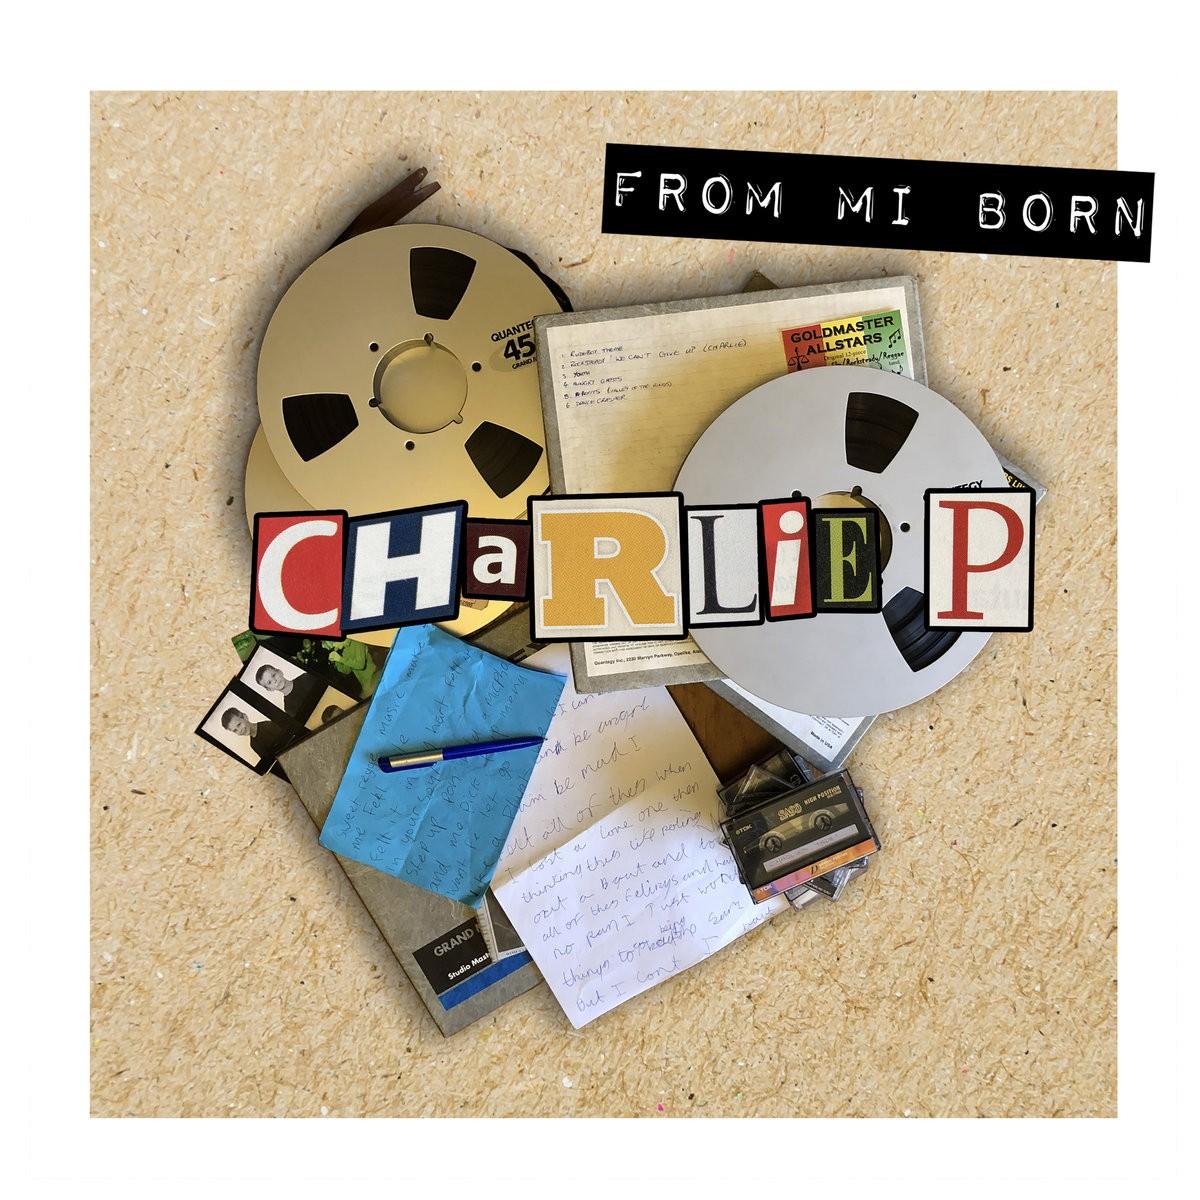 Charlie P : Fom Mi Born | LP / 33T  |  UK